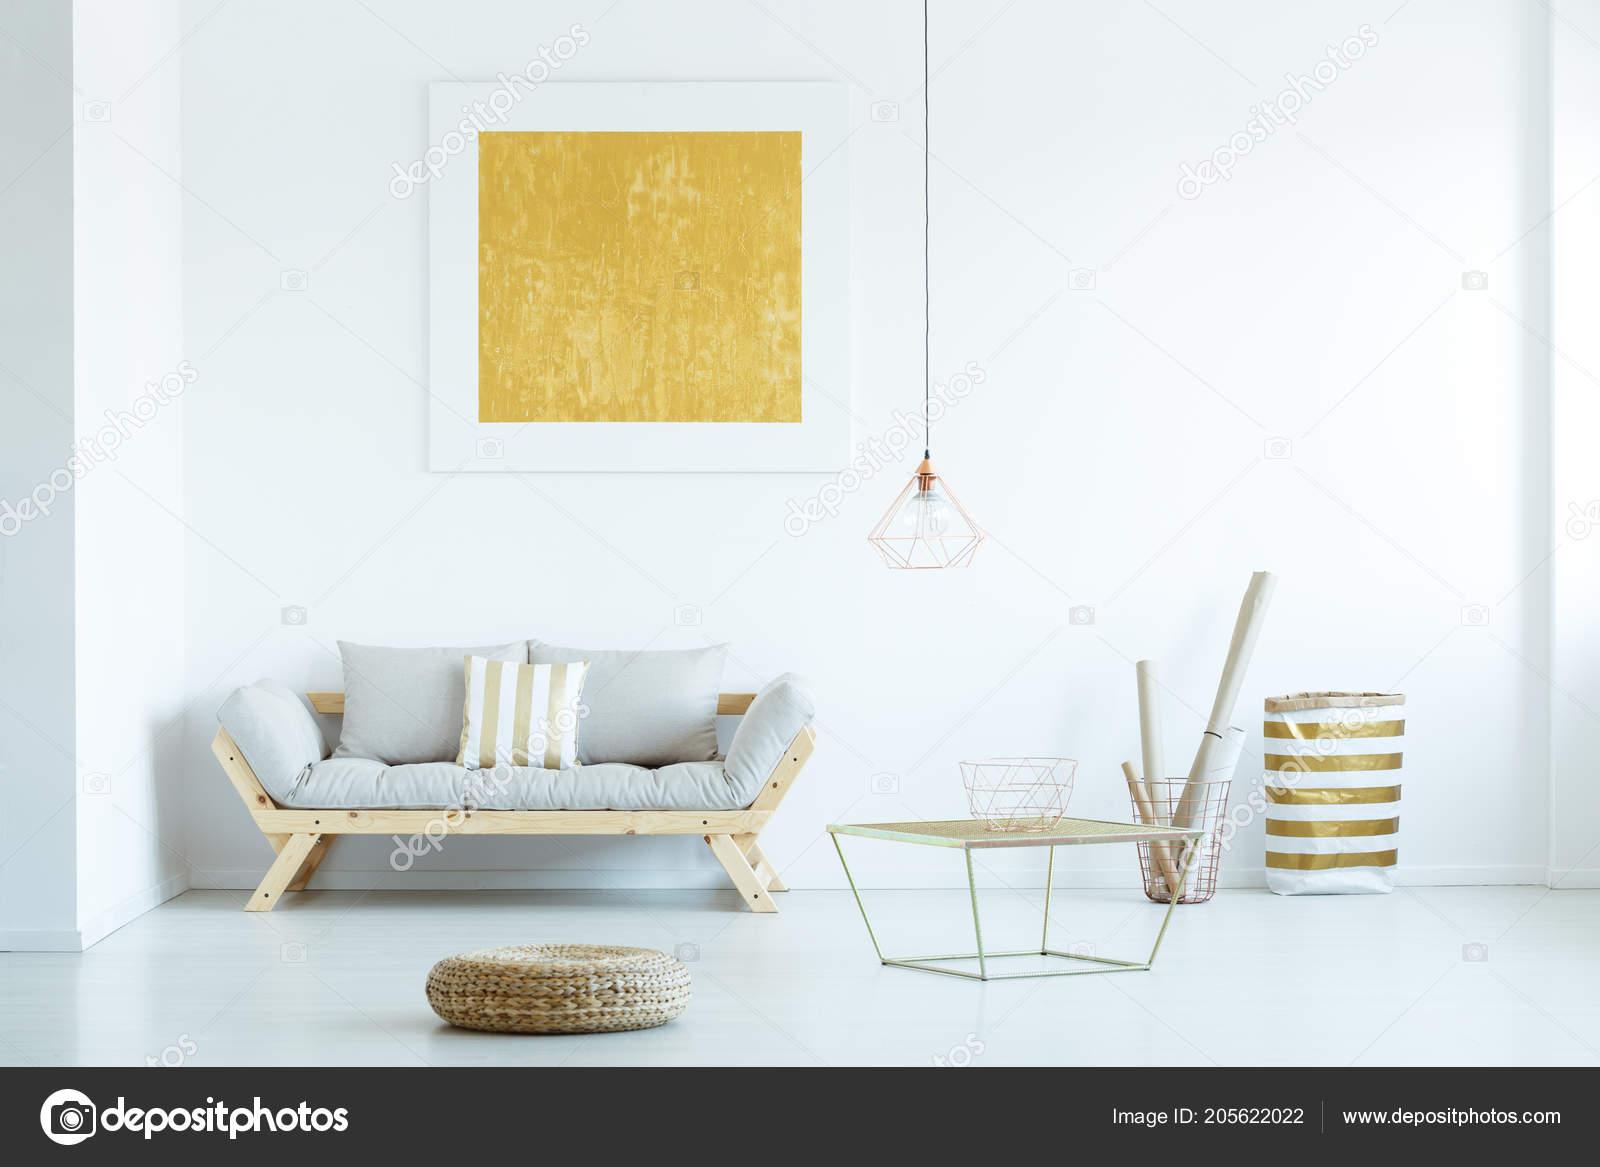 Pouf Table Grey Sofa Yellow Painting Modern Living Room